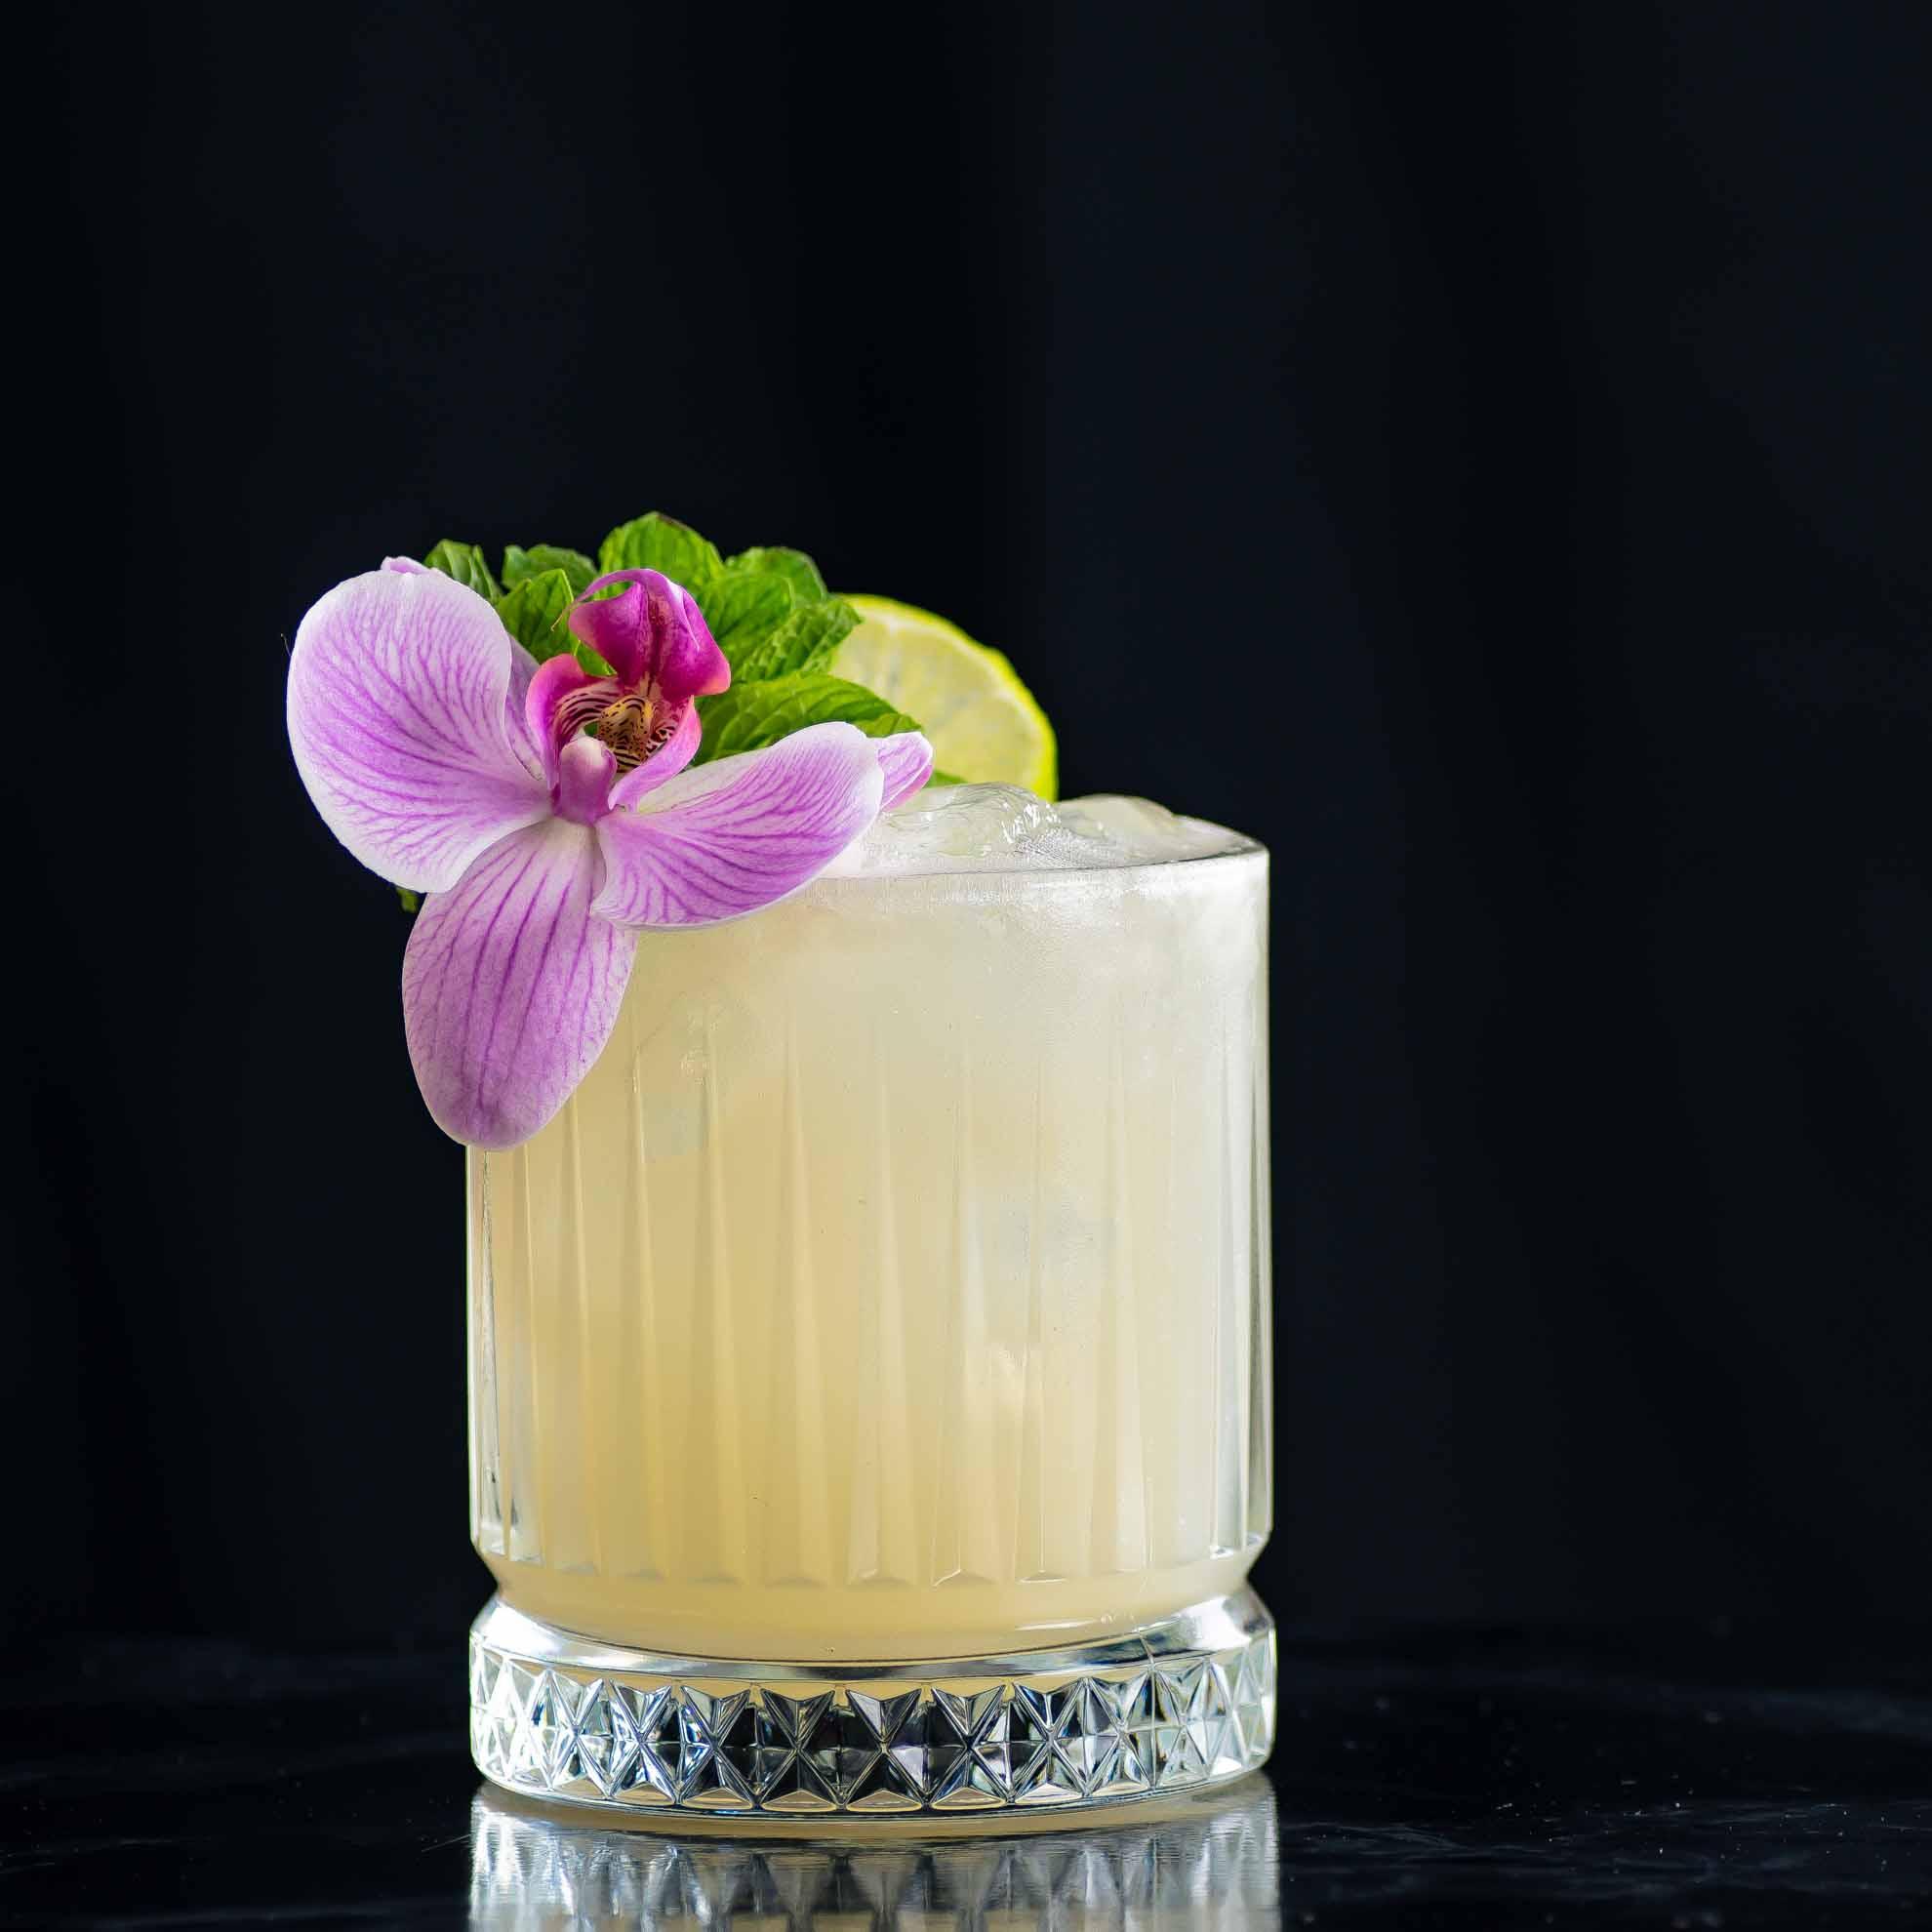 Der Tia Mia Cocktail - ein Mai Tai mit Mezcal von Ivy Mix.